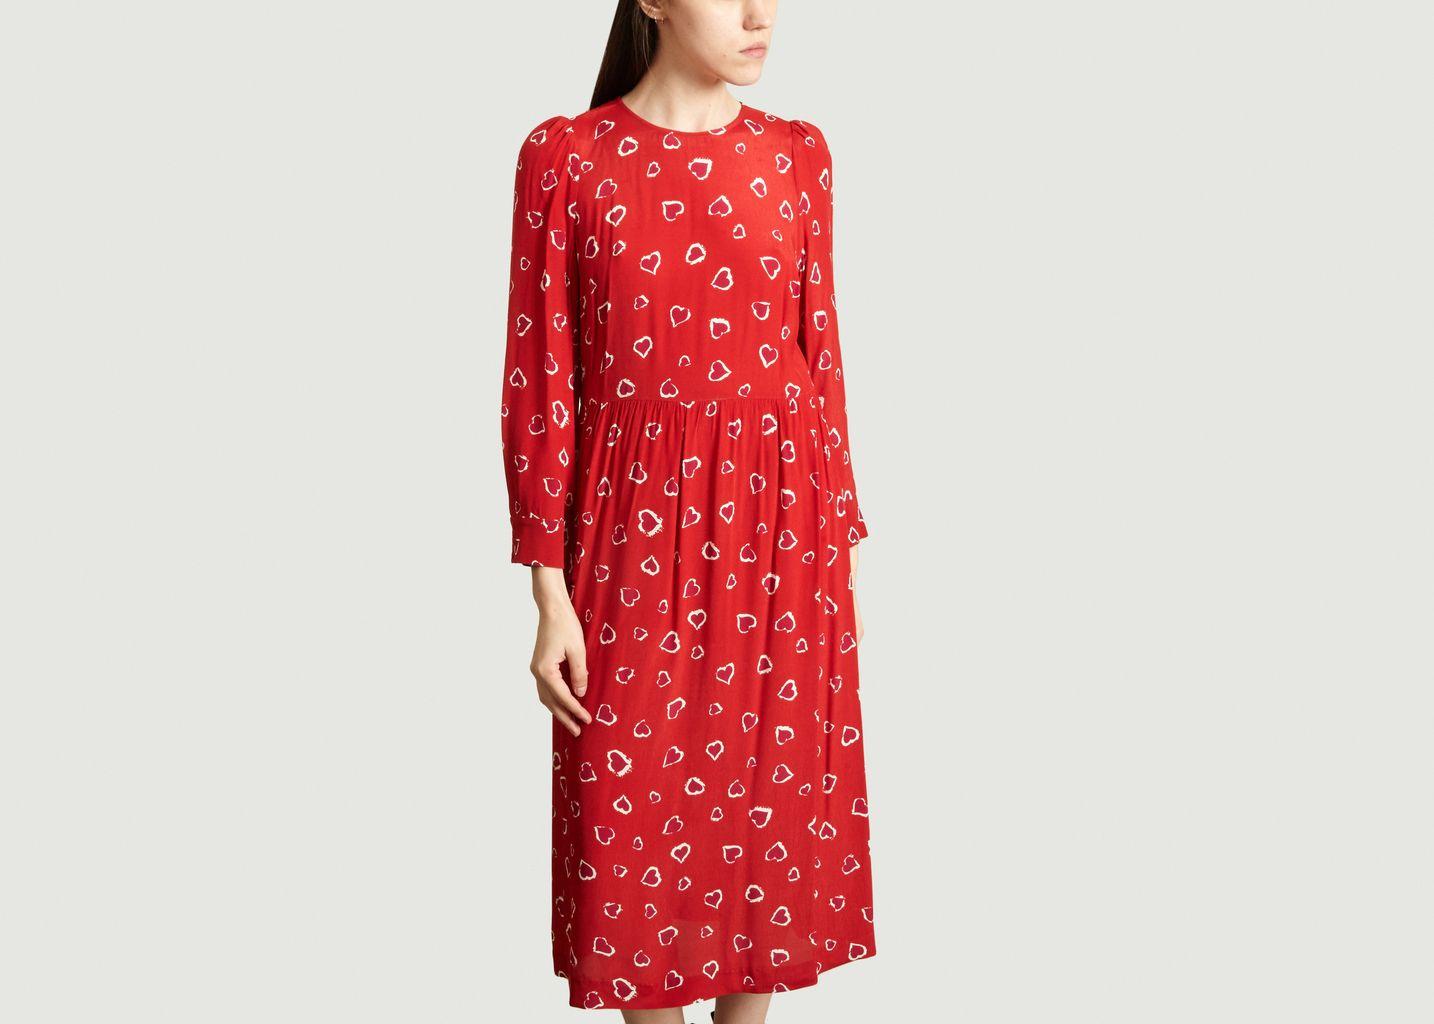 Printed Dress Red Tara Jarmon L Exception